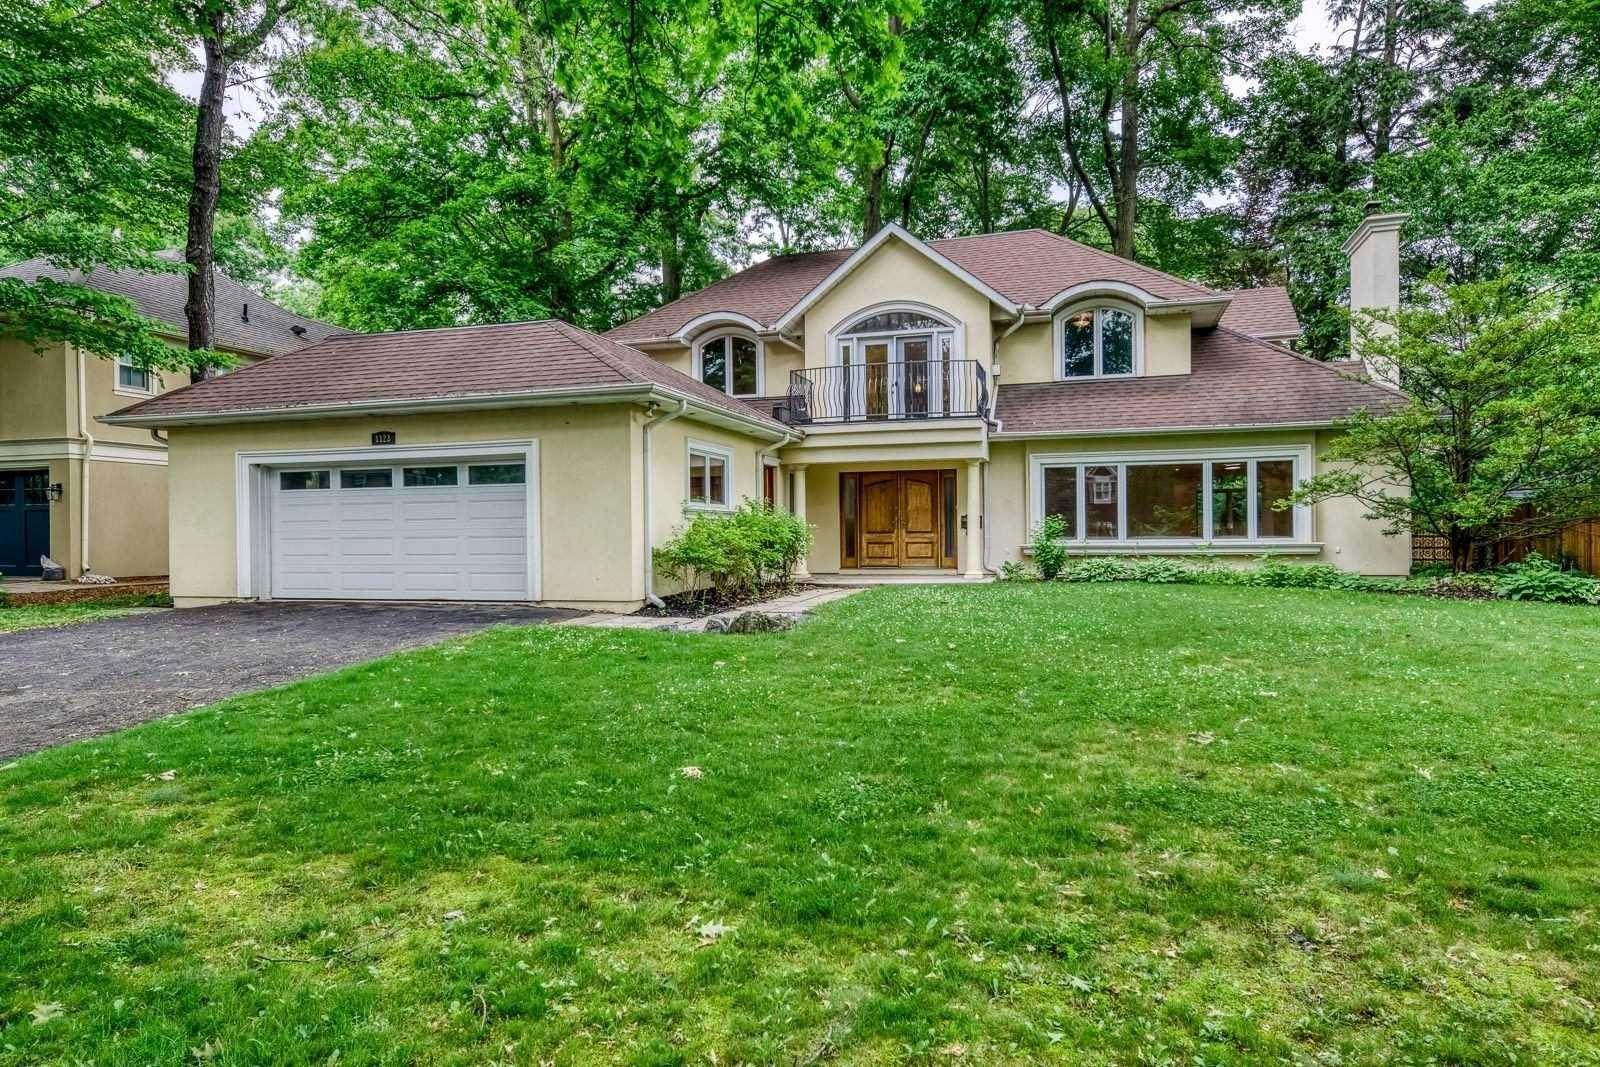 Main Photo: 1123 Morrison Heights Drive in Oakville: Eastlake House (2-Storey) for sale : MLS®# W5289049